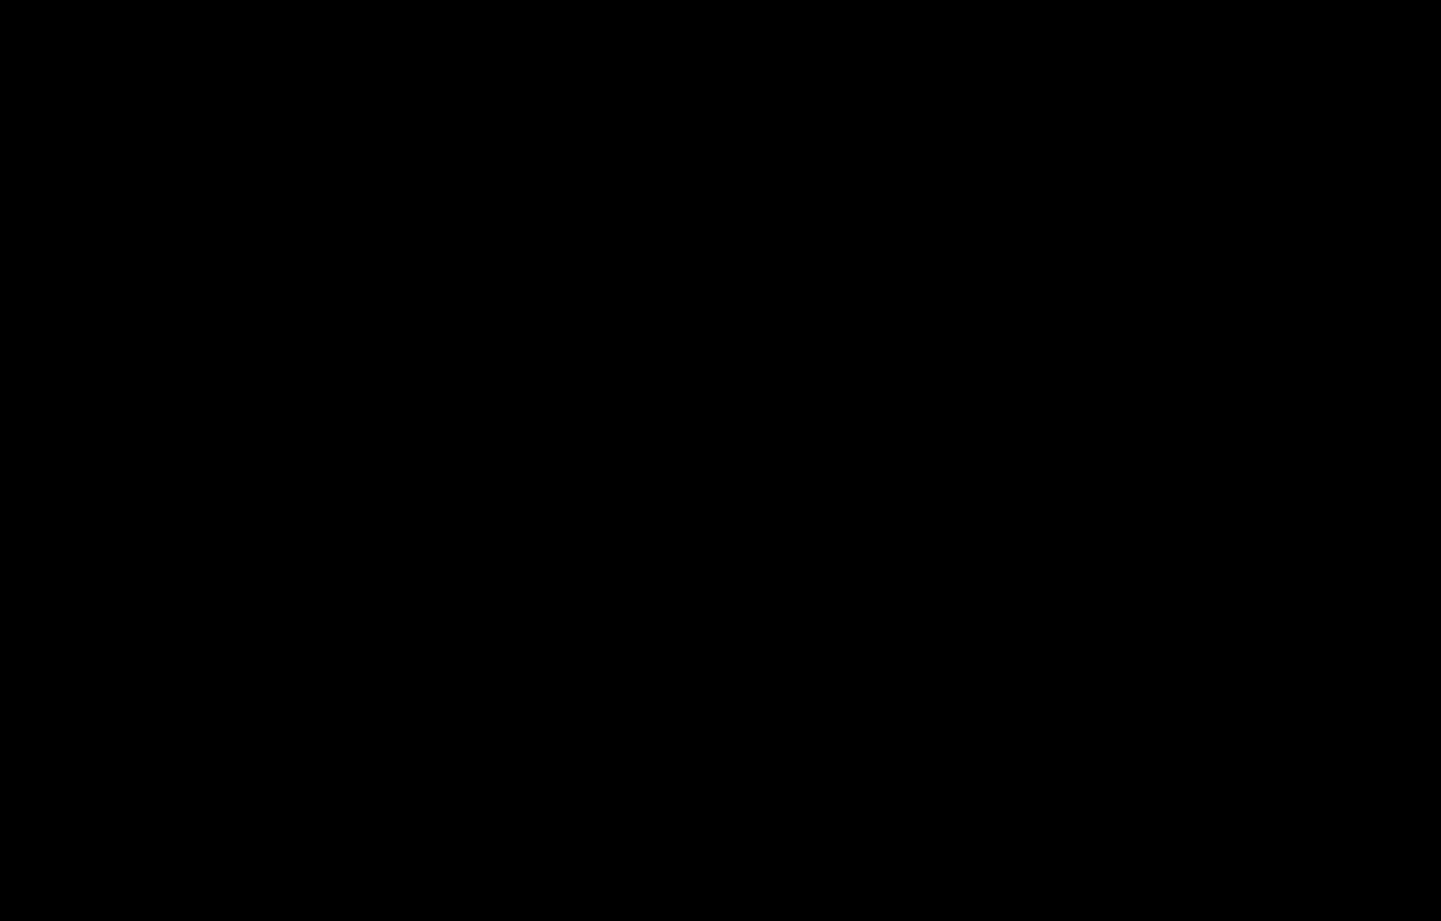 blackback